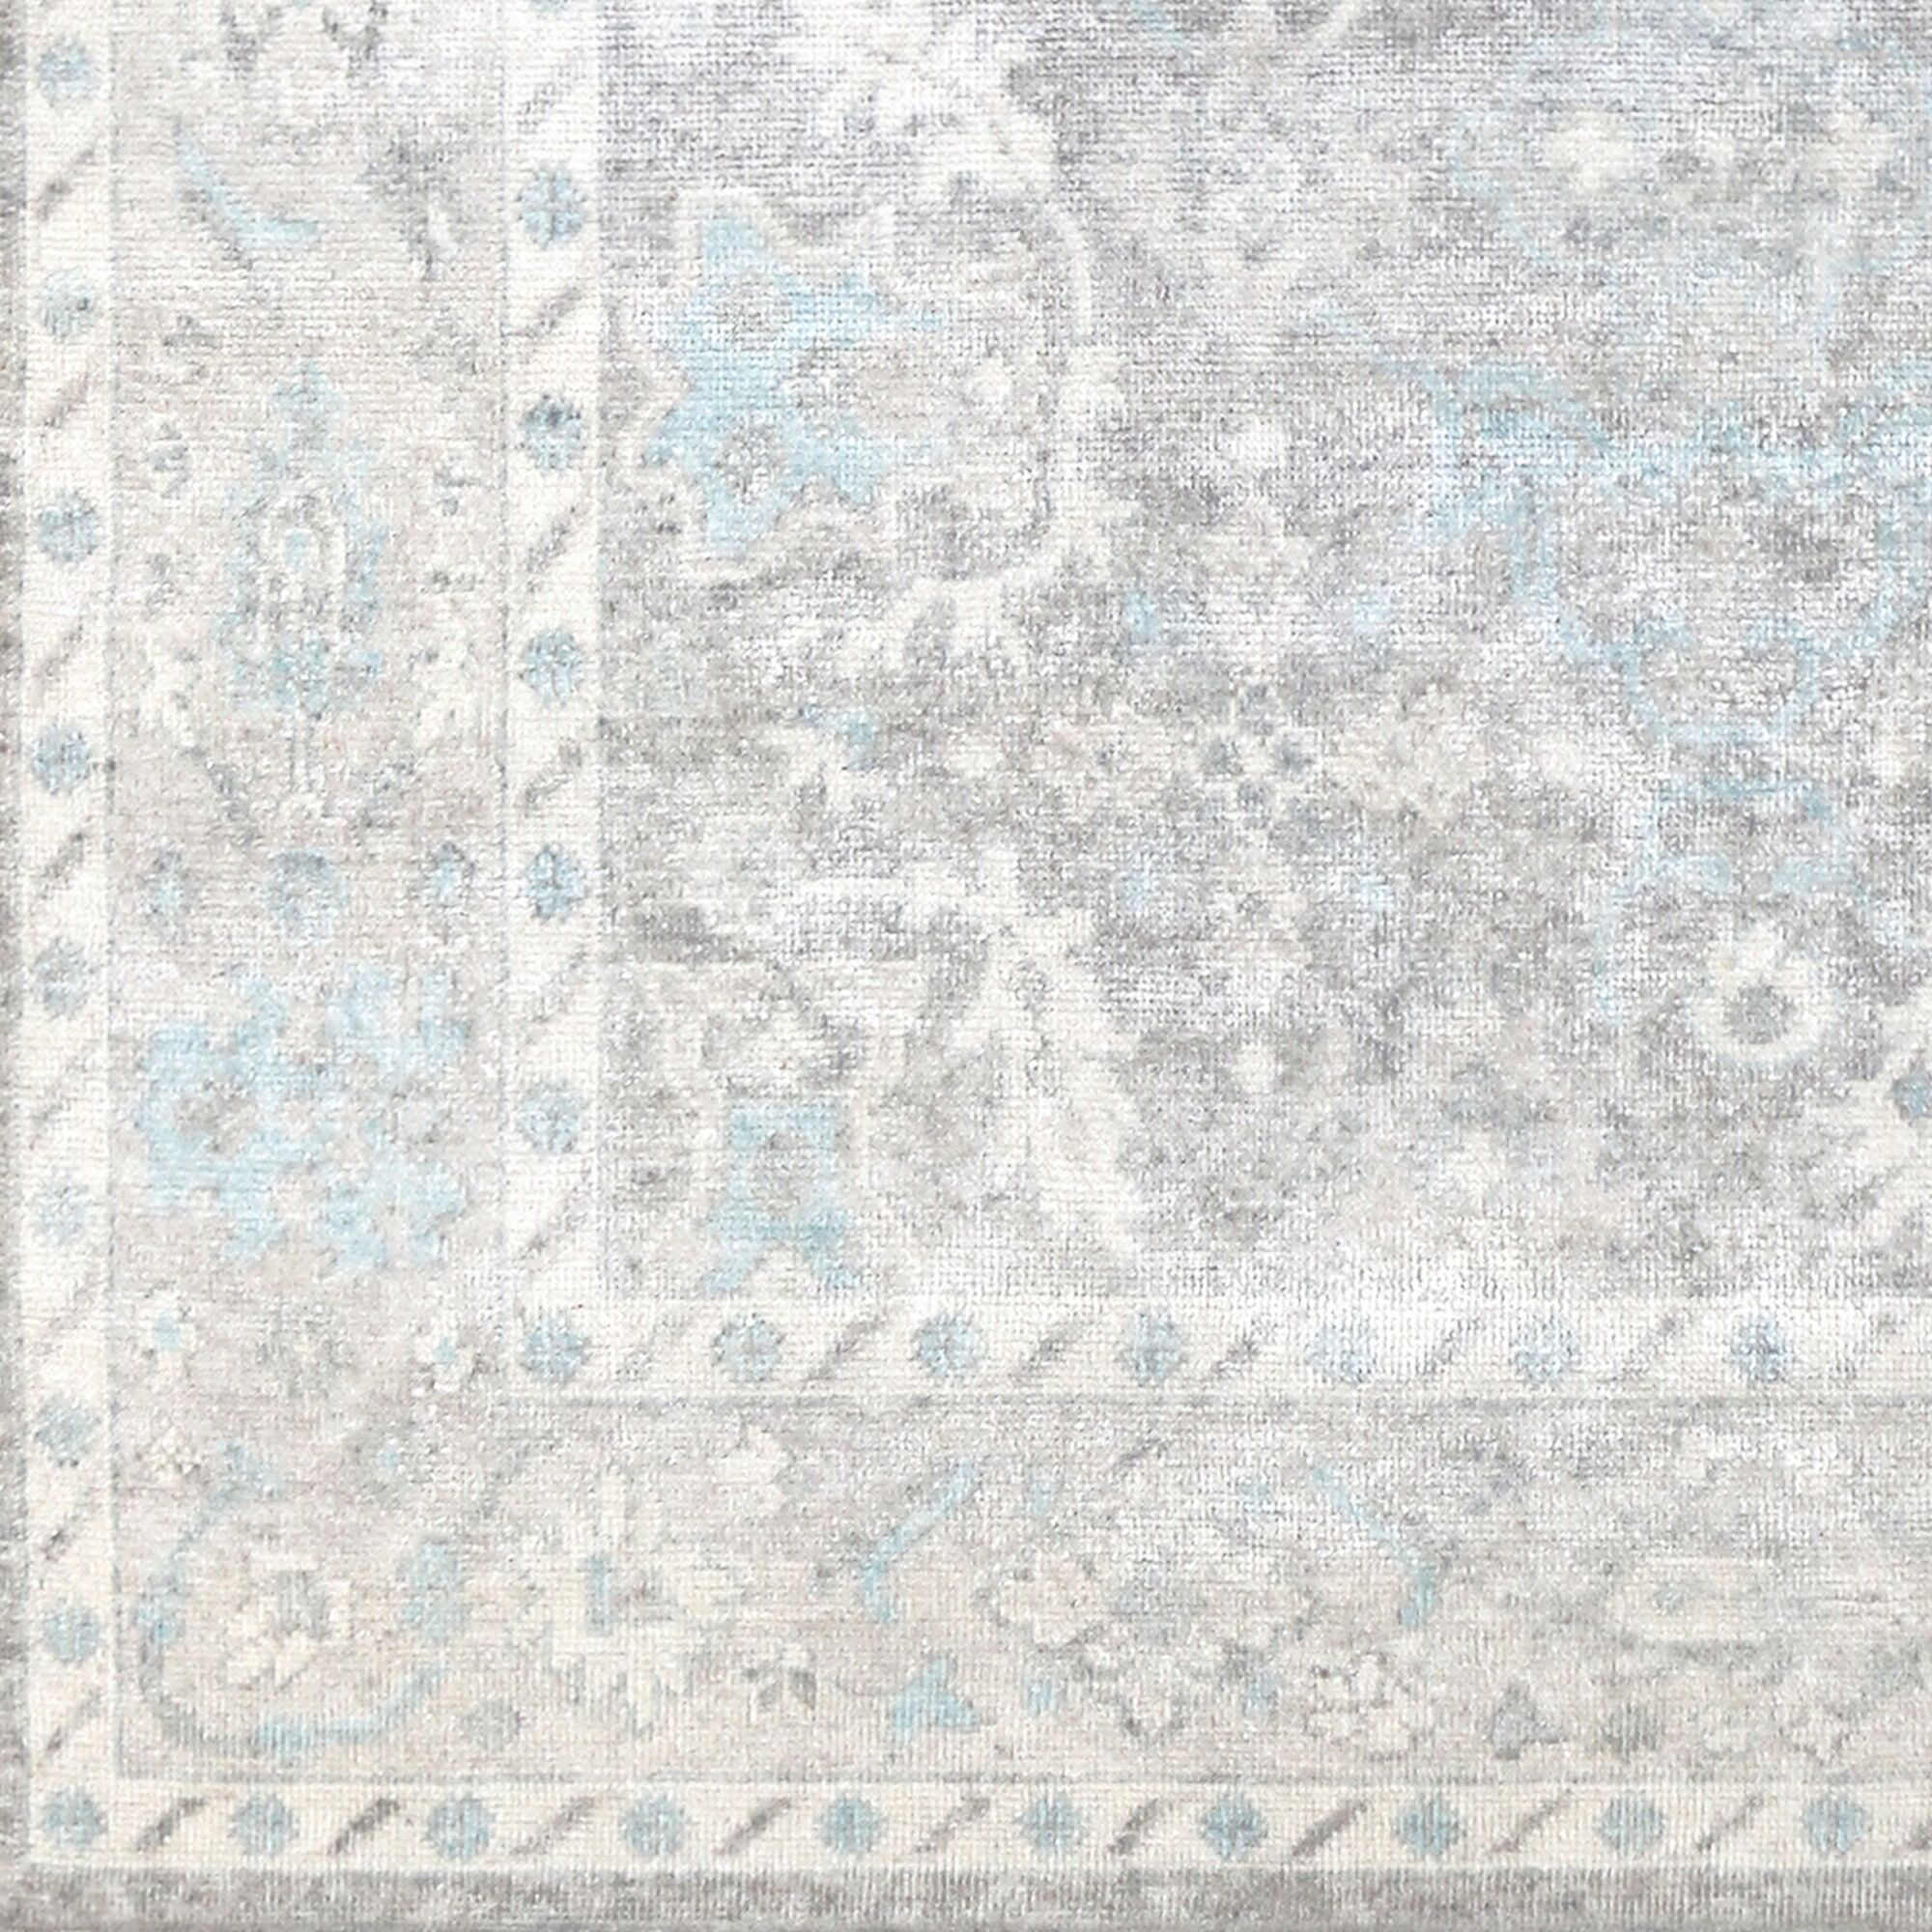 Gerhardina Vintage Floral Hand Knotted Light Gray Area Rug Rug Size: Rectangle 9' x 12'